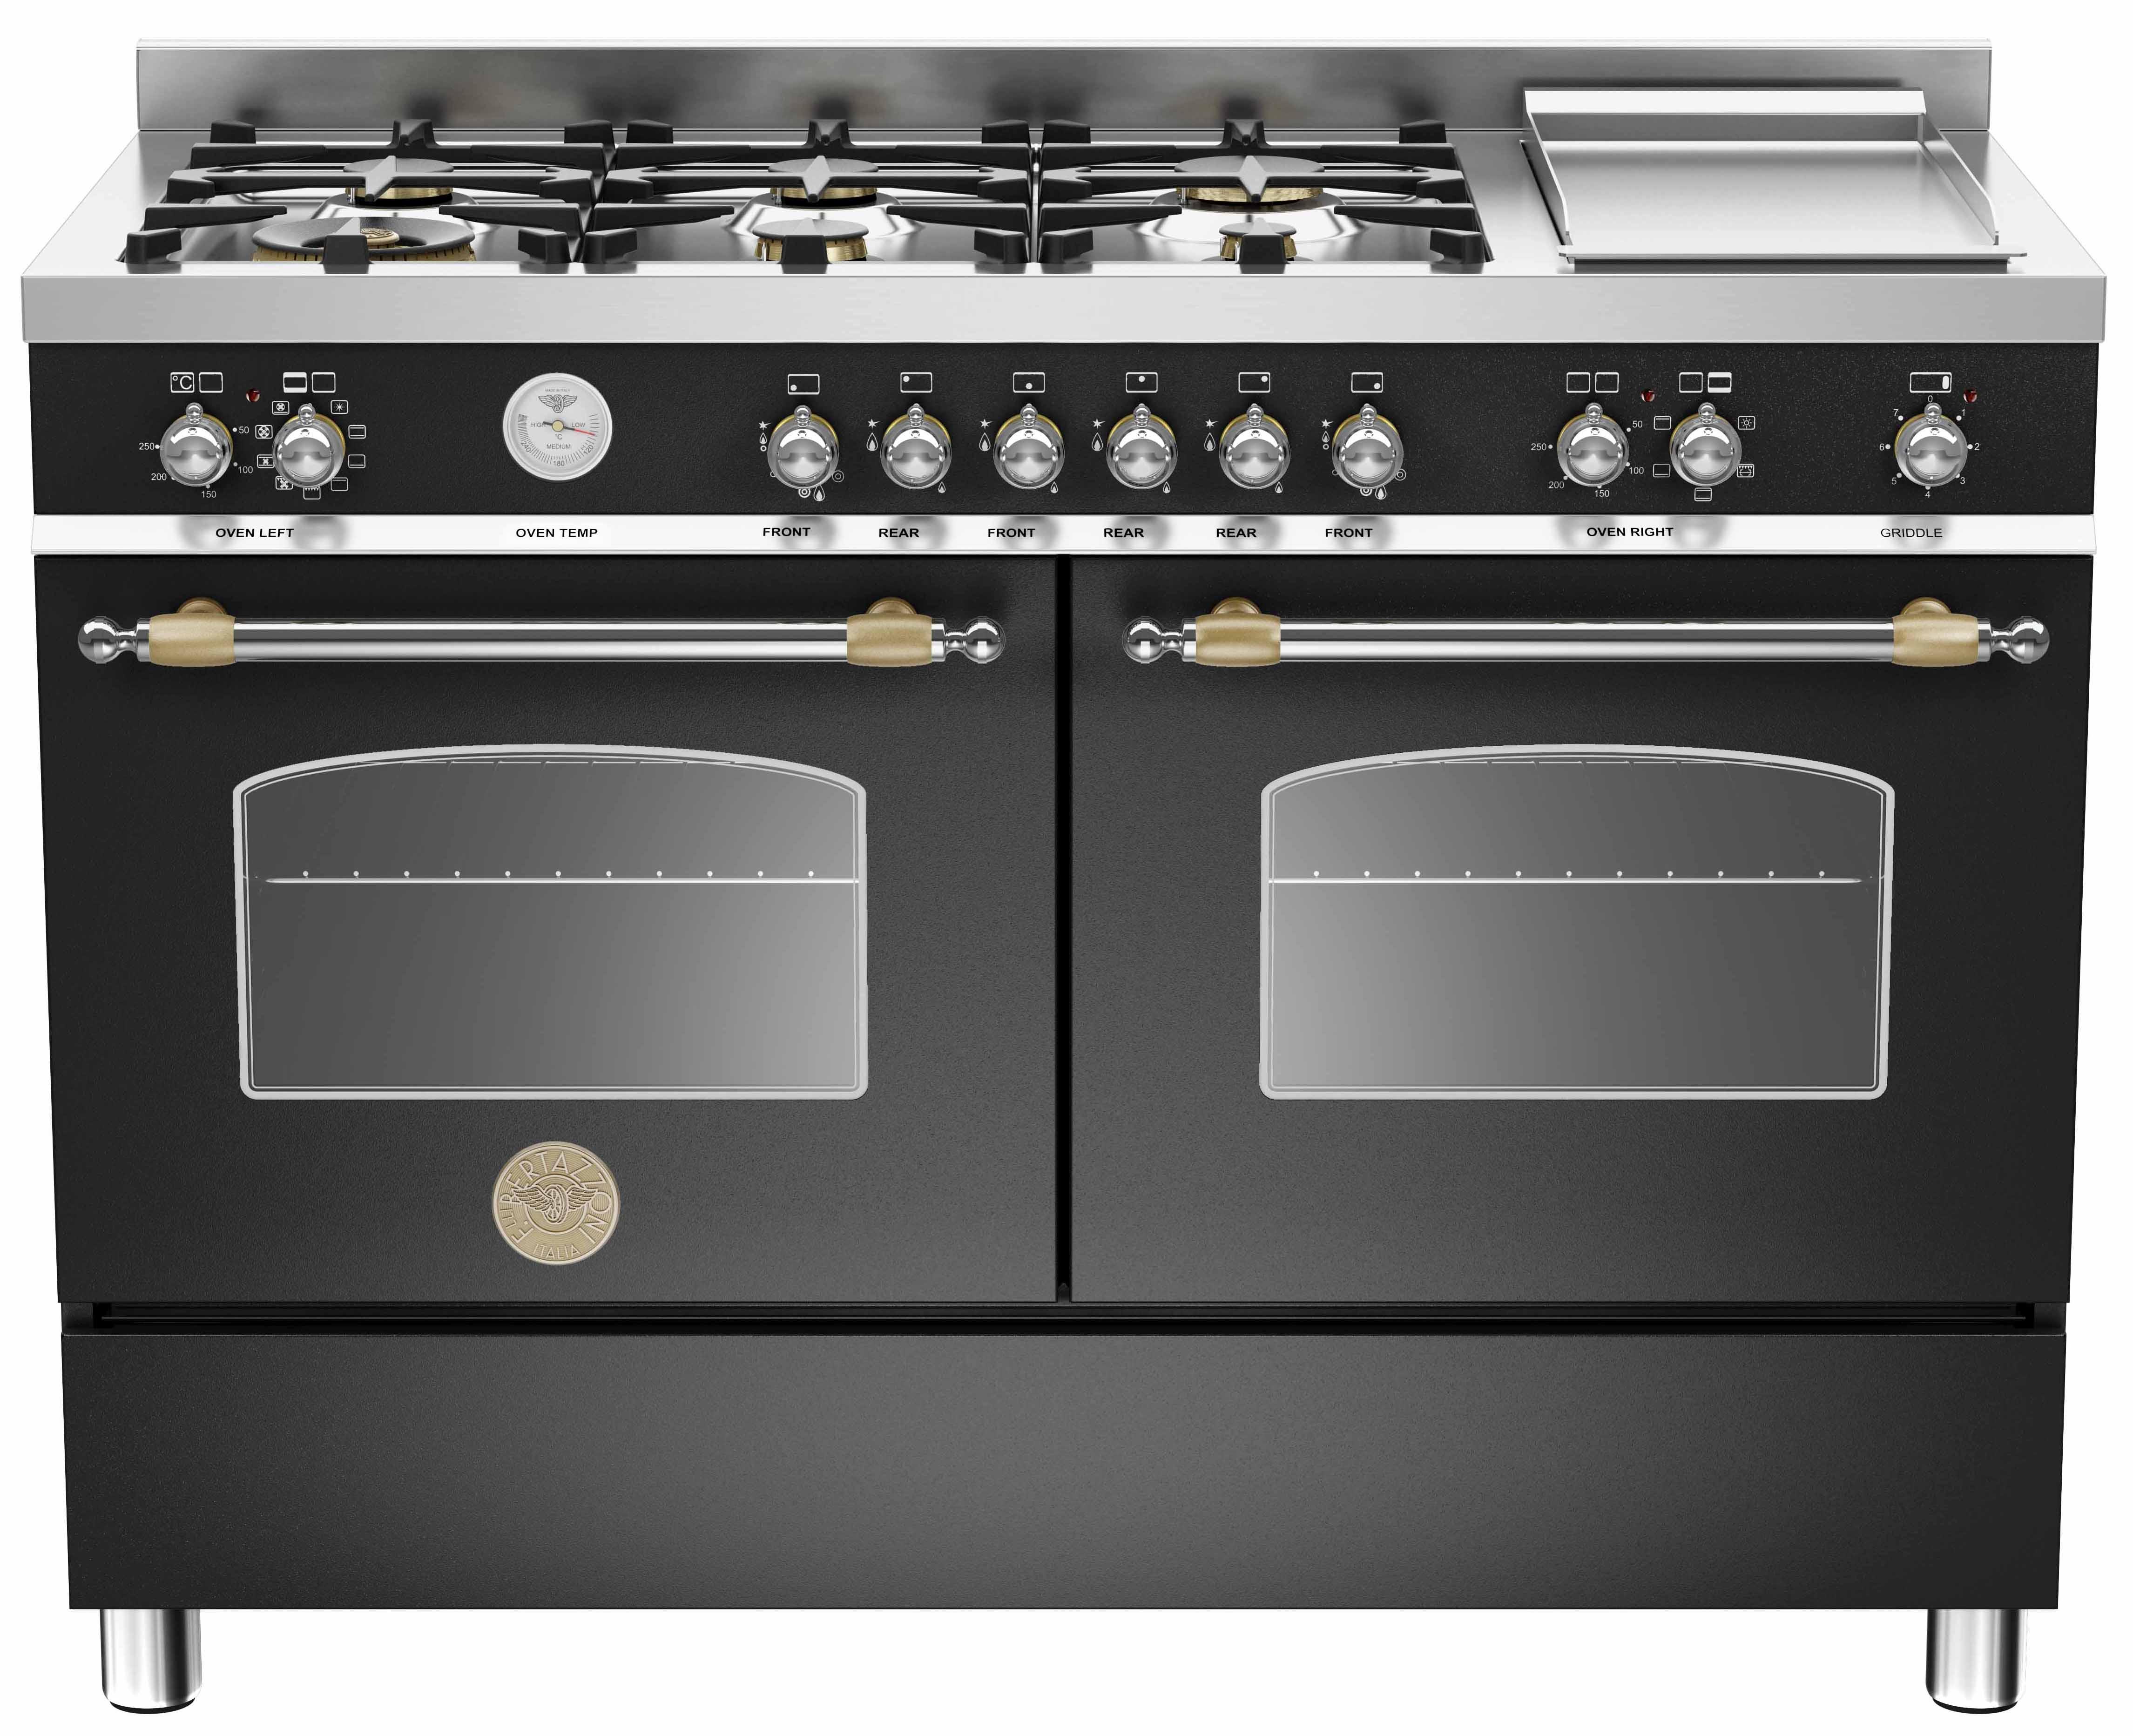 Bertazzoni HER1206 Gasspis 120 cm, 2 ugnar, 6 brännare + elektrisk tepanyaki, Svart